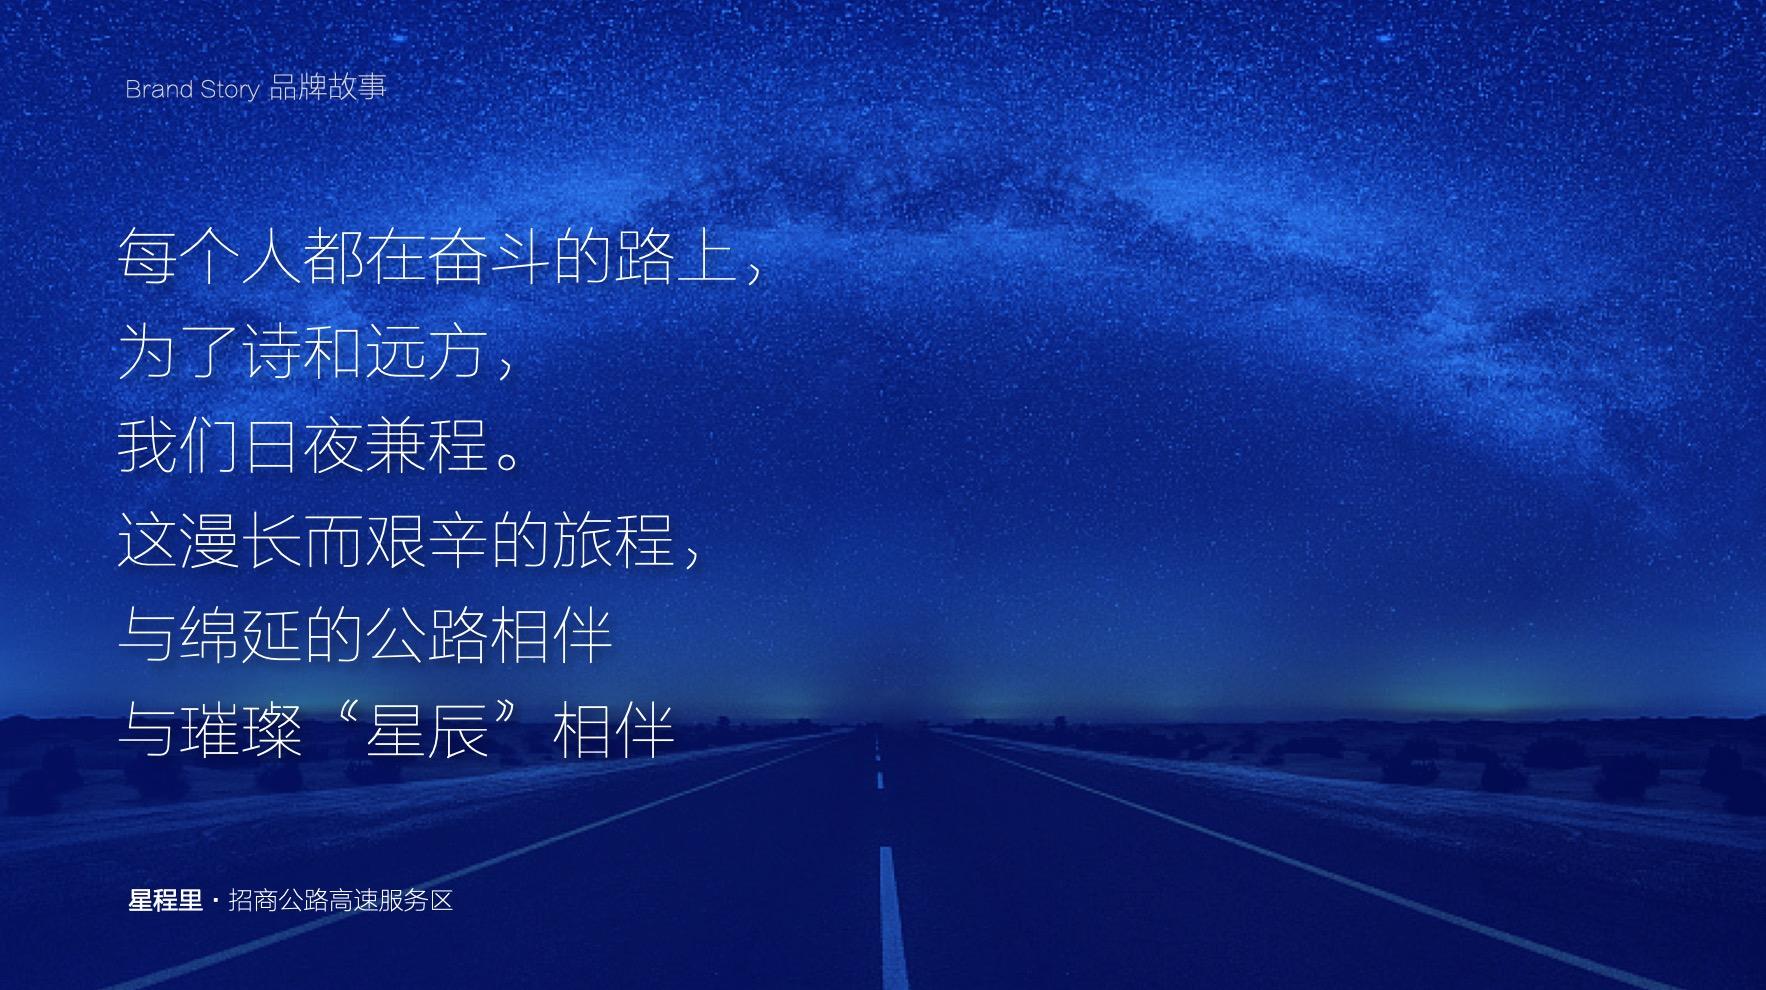 QQ20201121-192103@2x